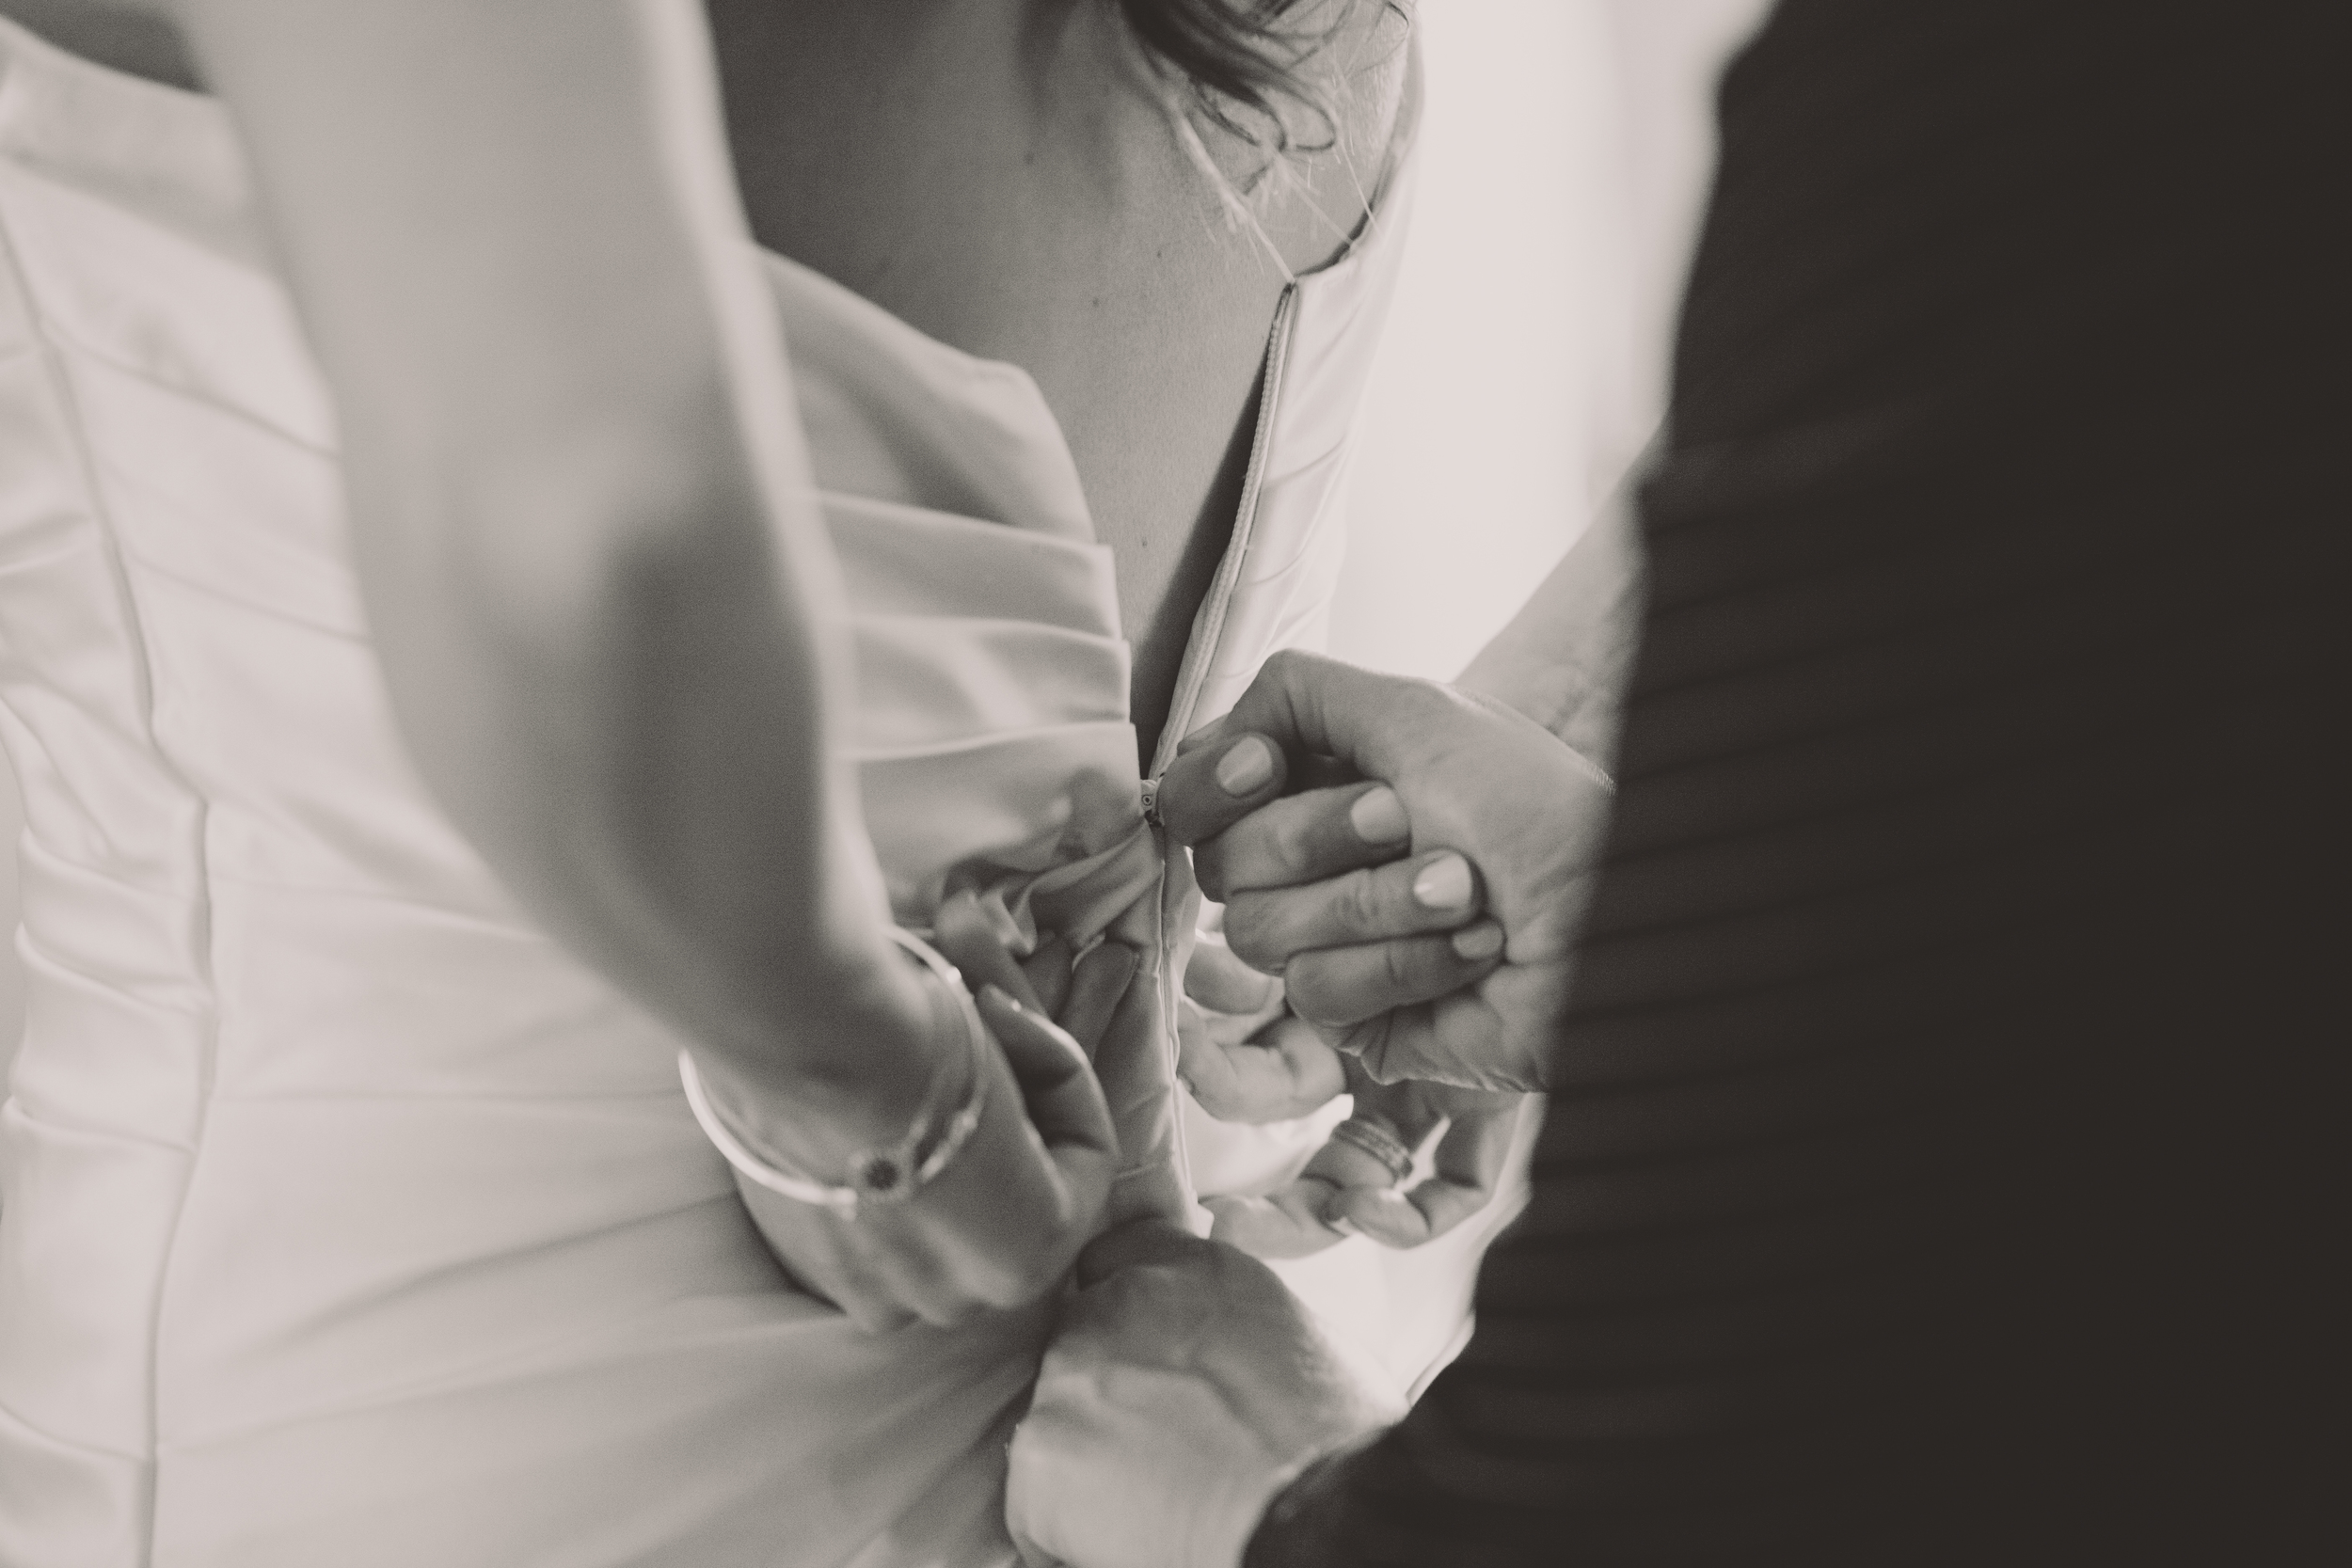 zipping up the dress